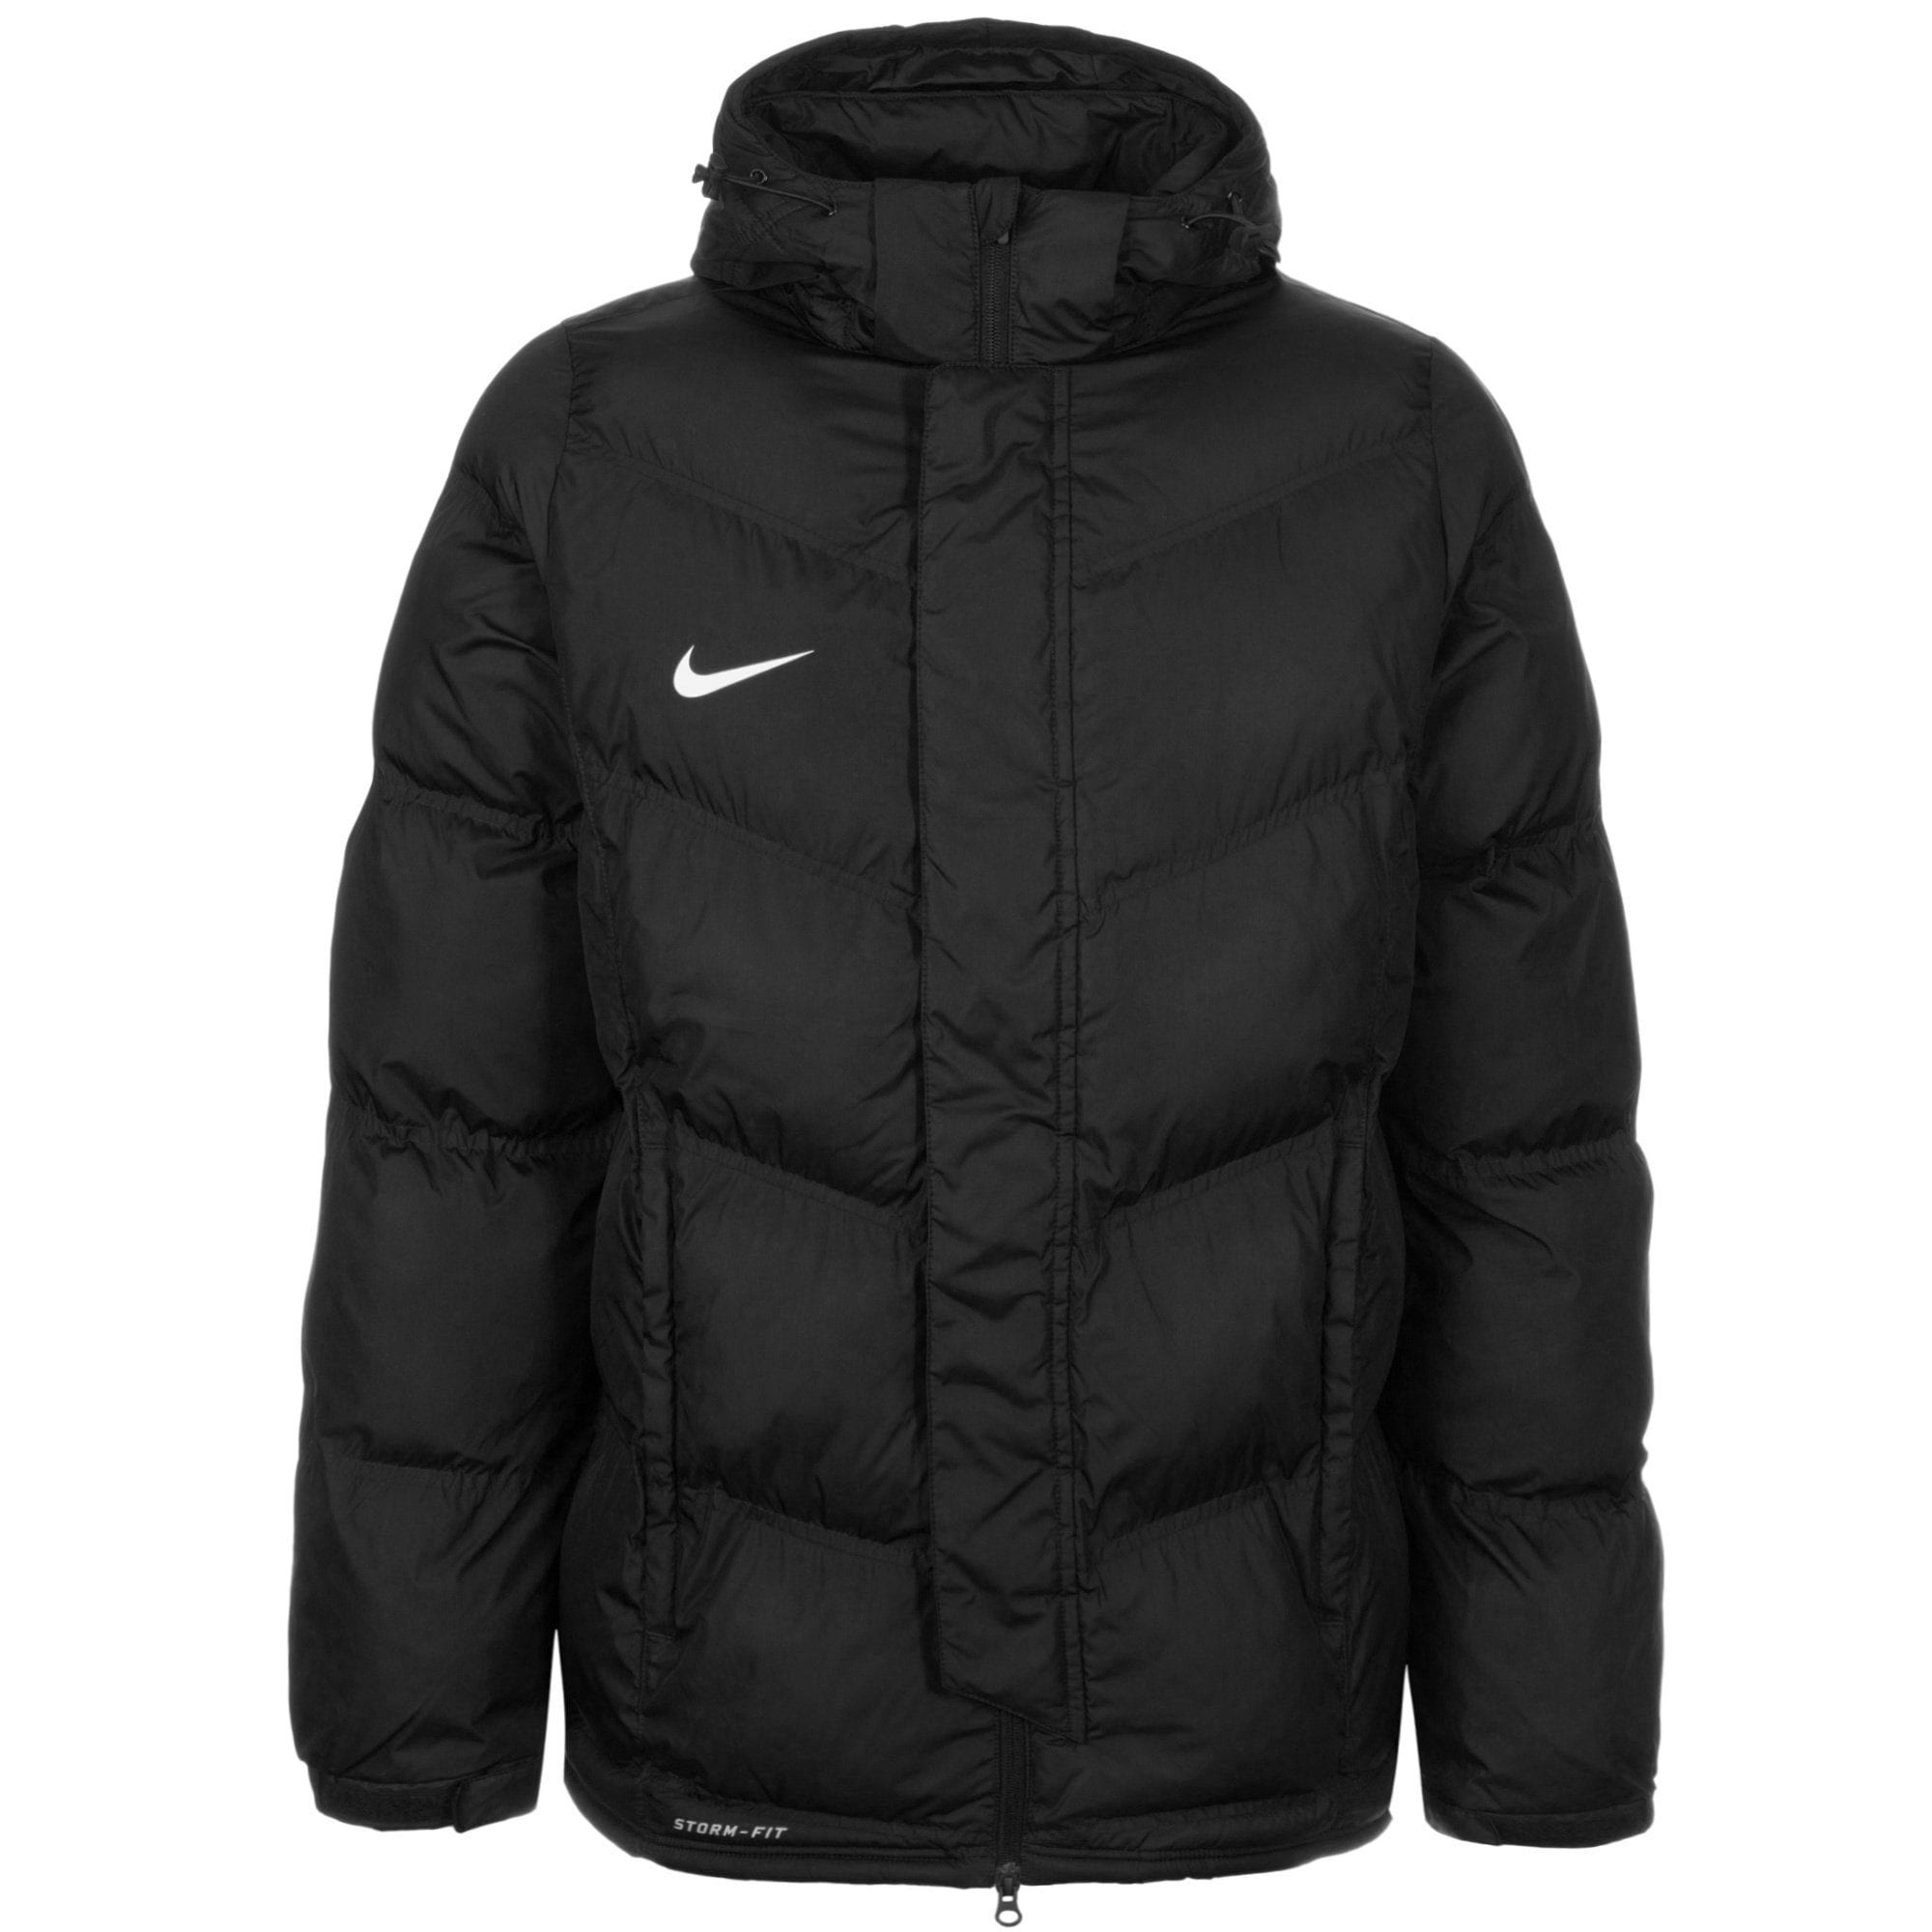 huge sale fresh styles dirt cheap Nike Winterjacke »Team« » BAUR